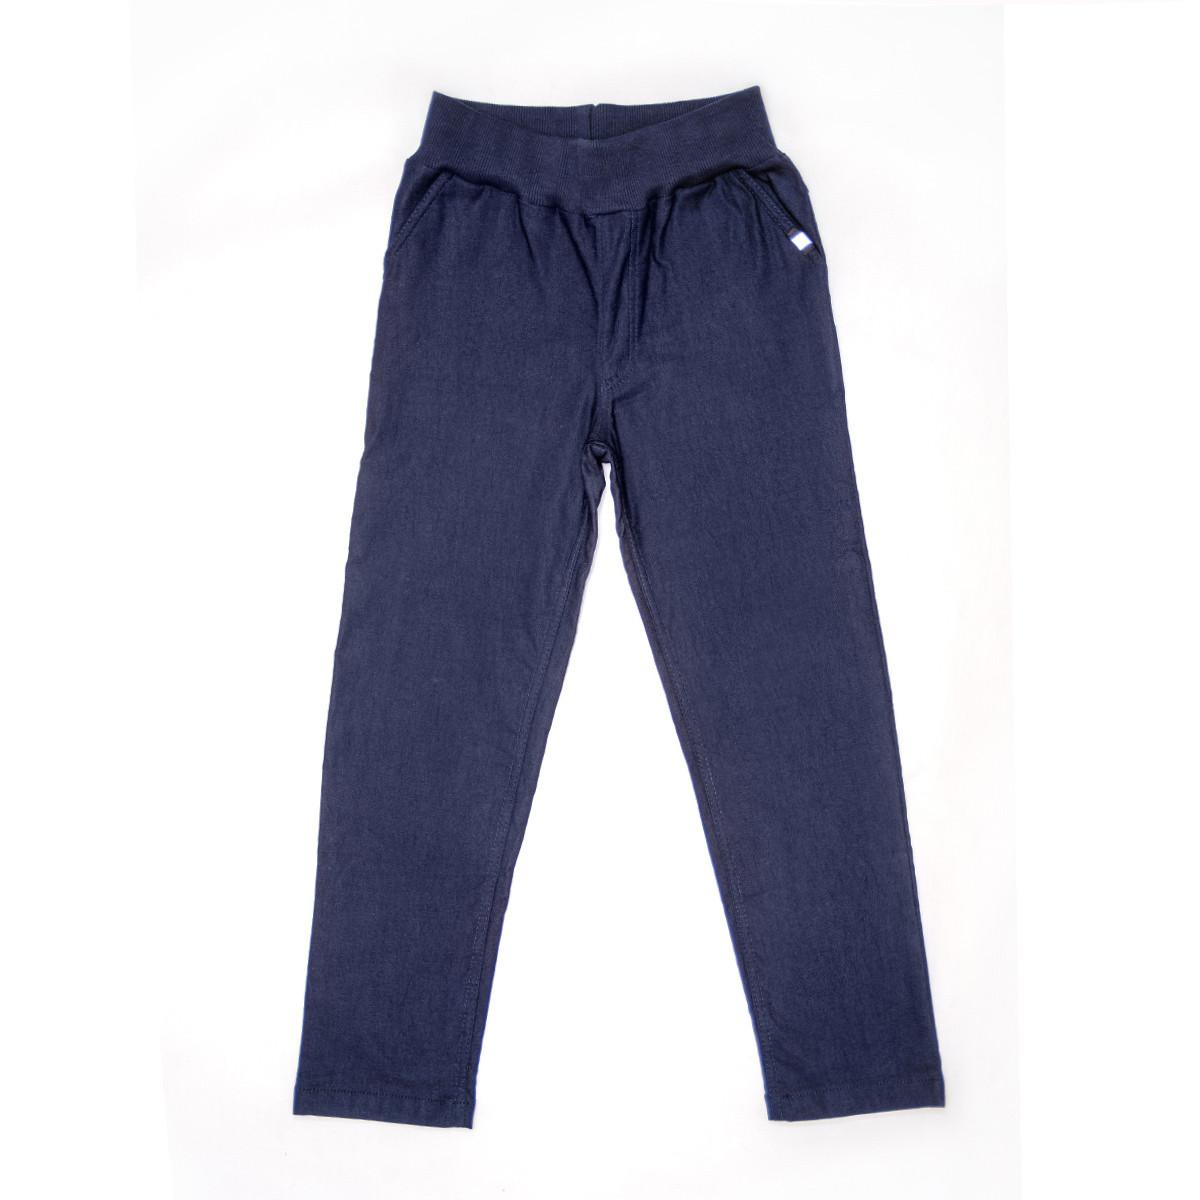 Брюки для мальчика утепленные р.140,146 SmileTime Warm Fashion, джинс